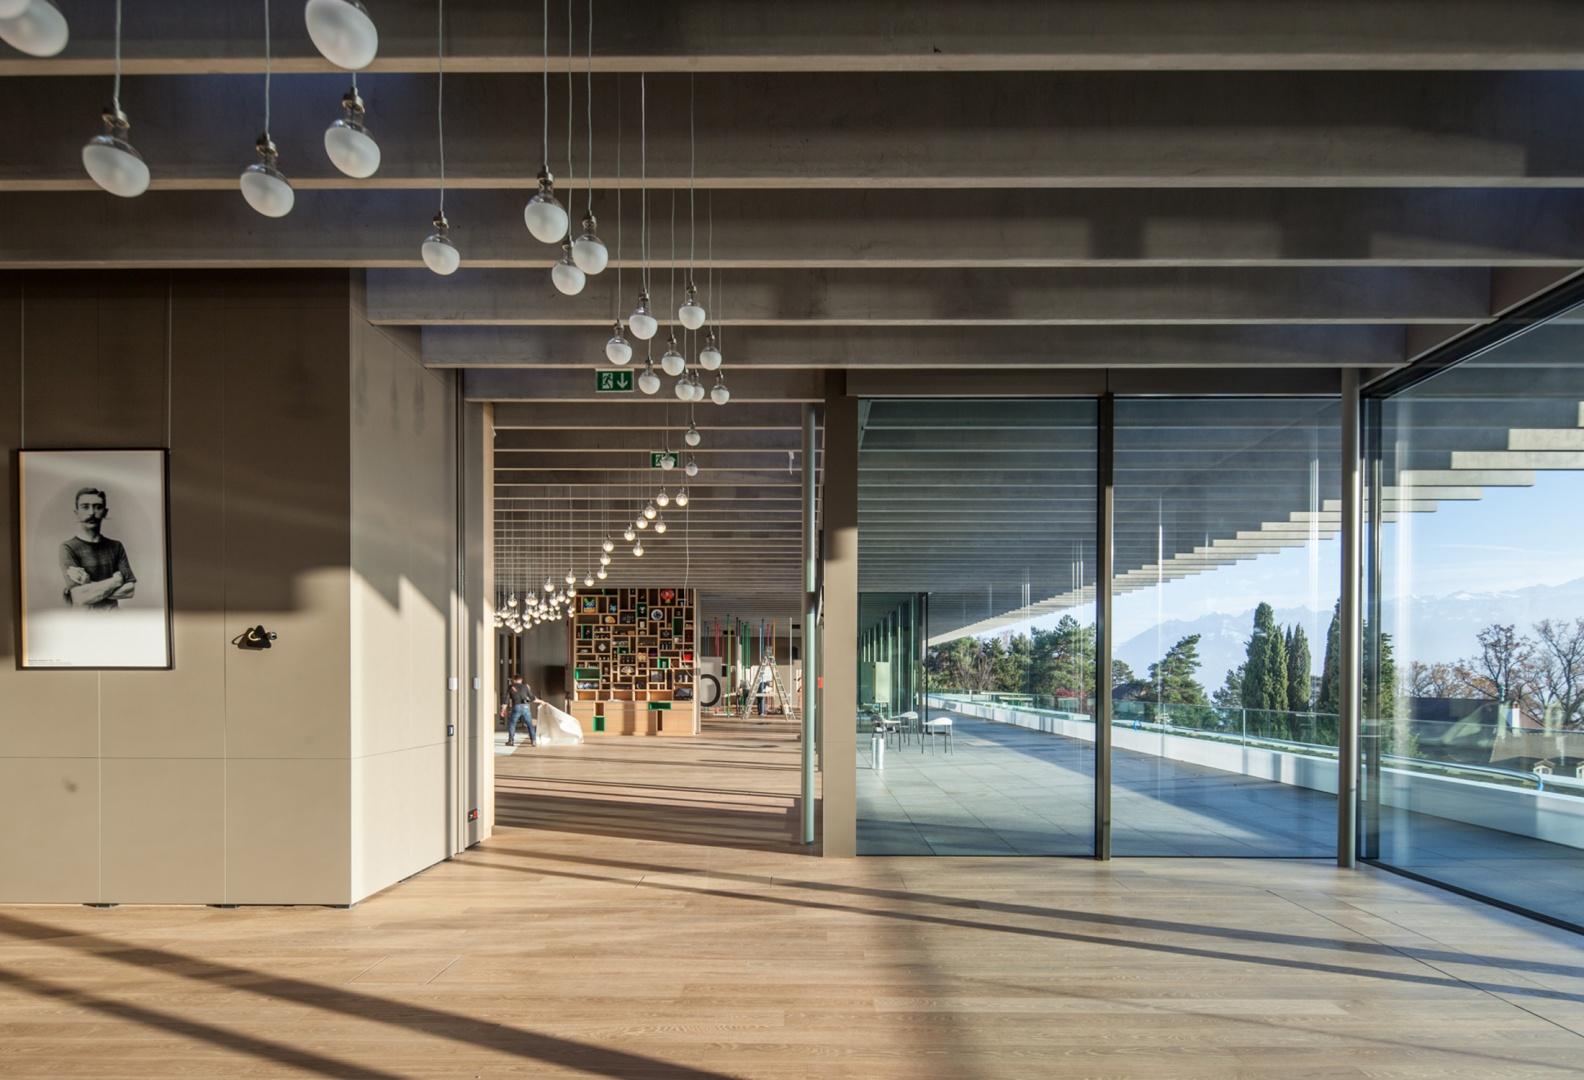 Salle expo et terrasse Musée olympique © Brauen Wälchli Architectes